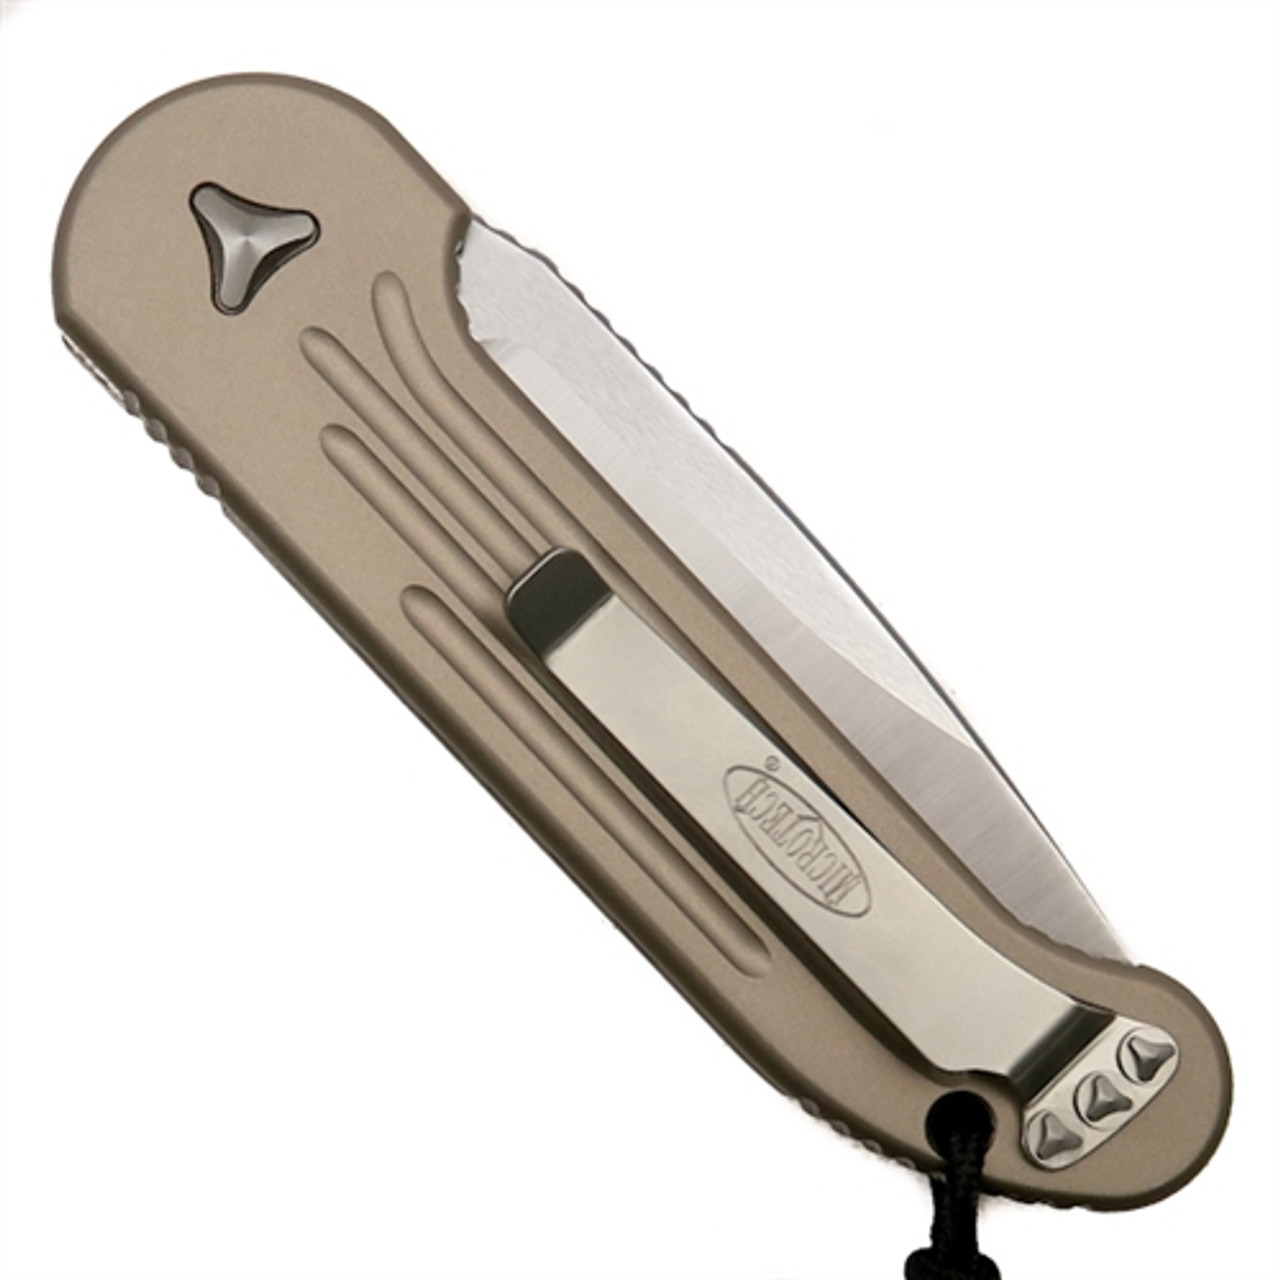 Microtech 135-4TA Tan LUDT Auto Knife, Satin Blade